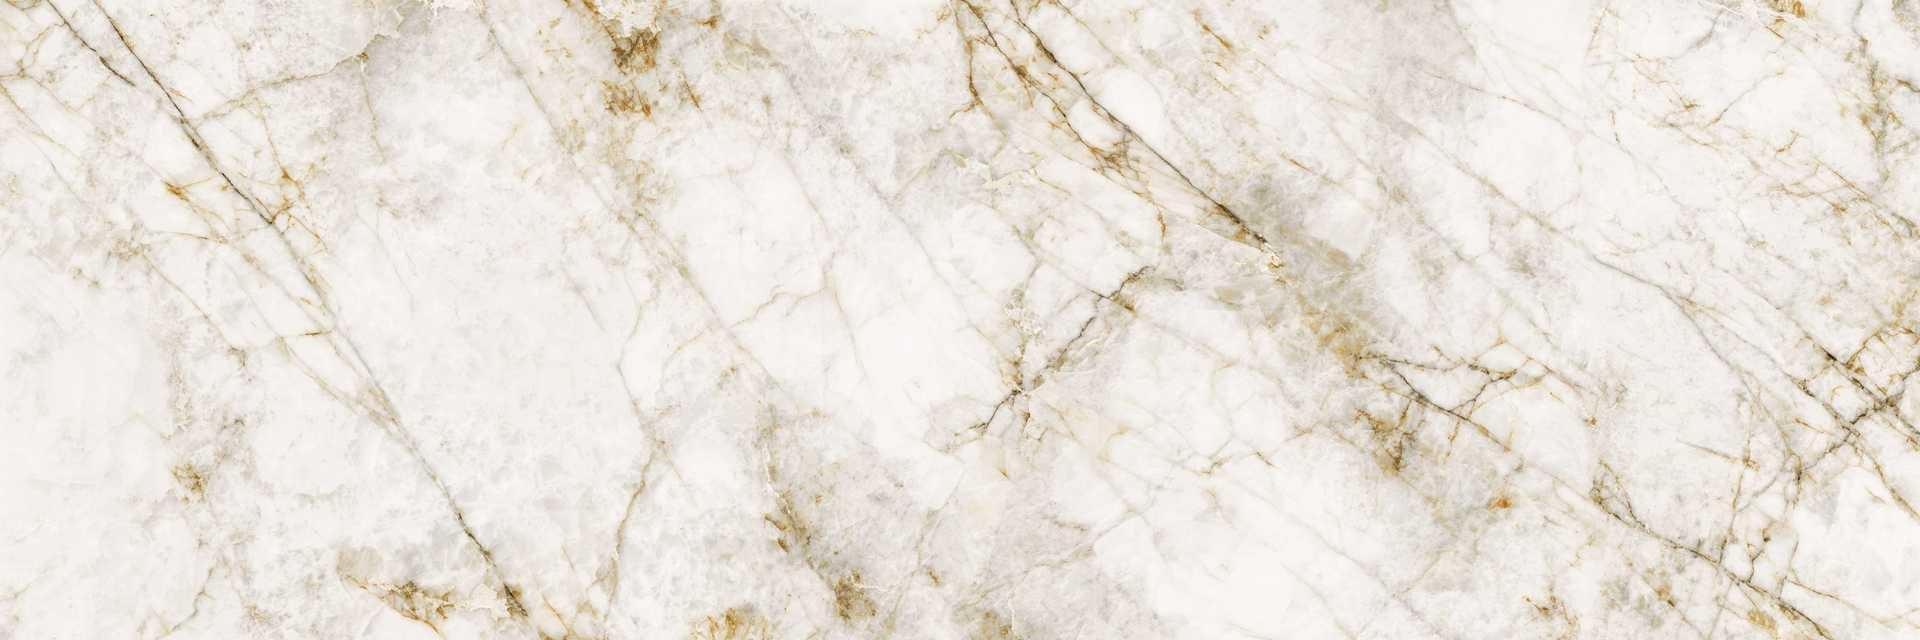 Obklad/dlažba Cuarzo Reno 120x360 cm, lesk